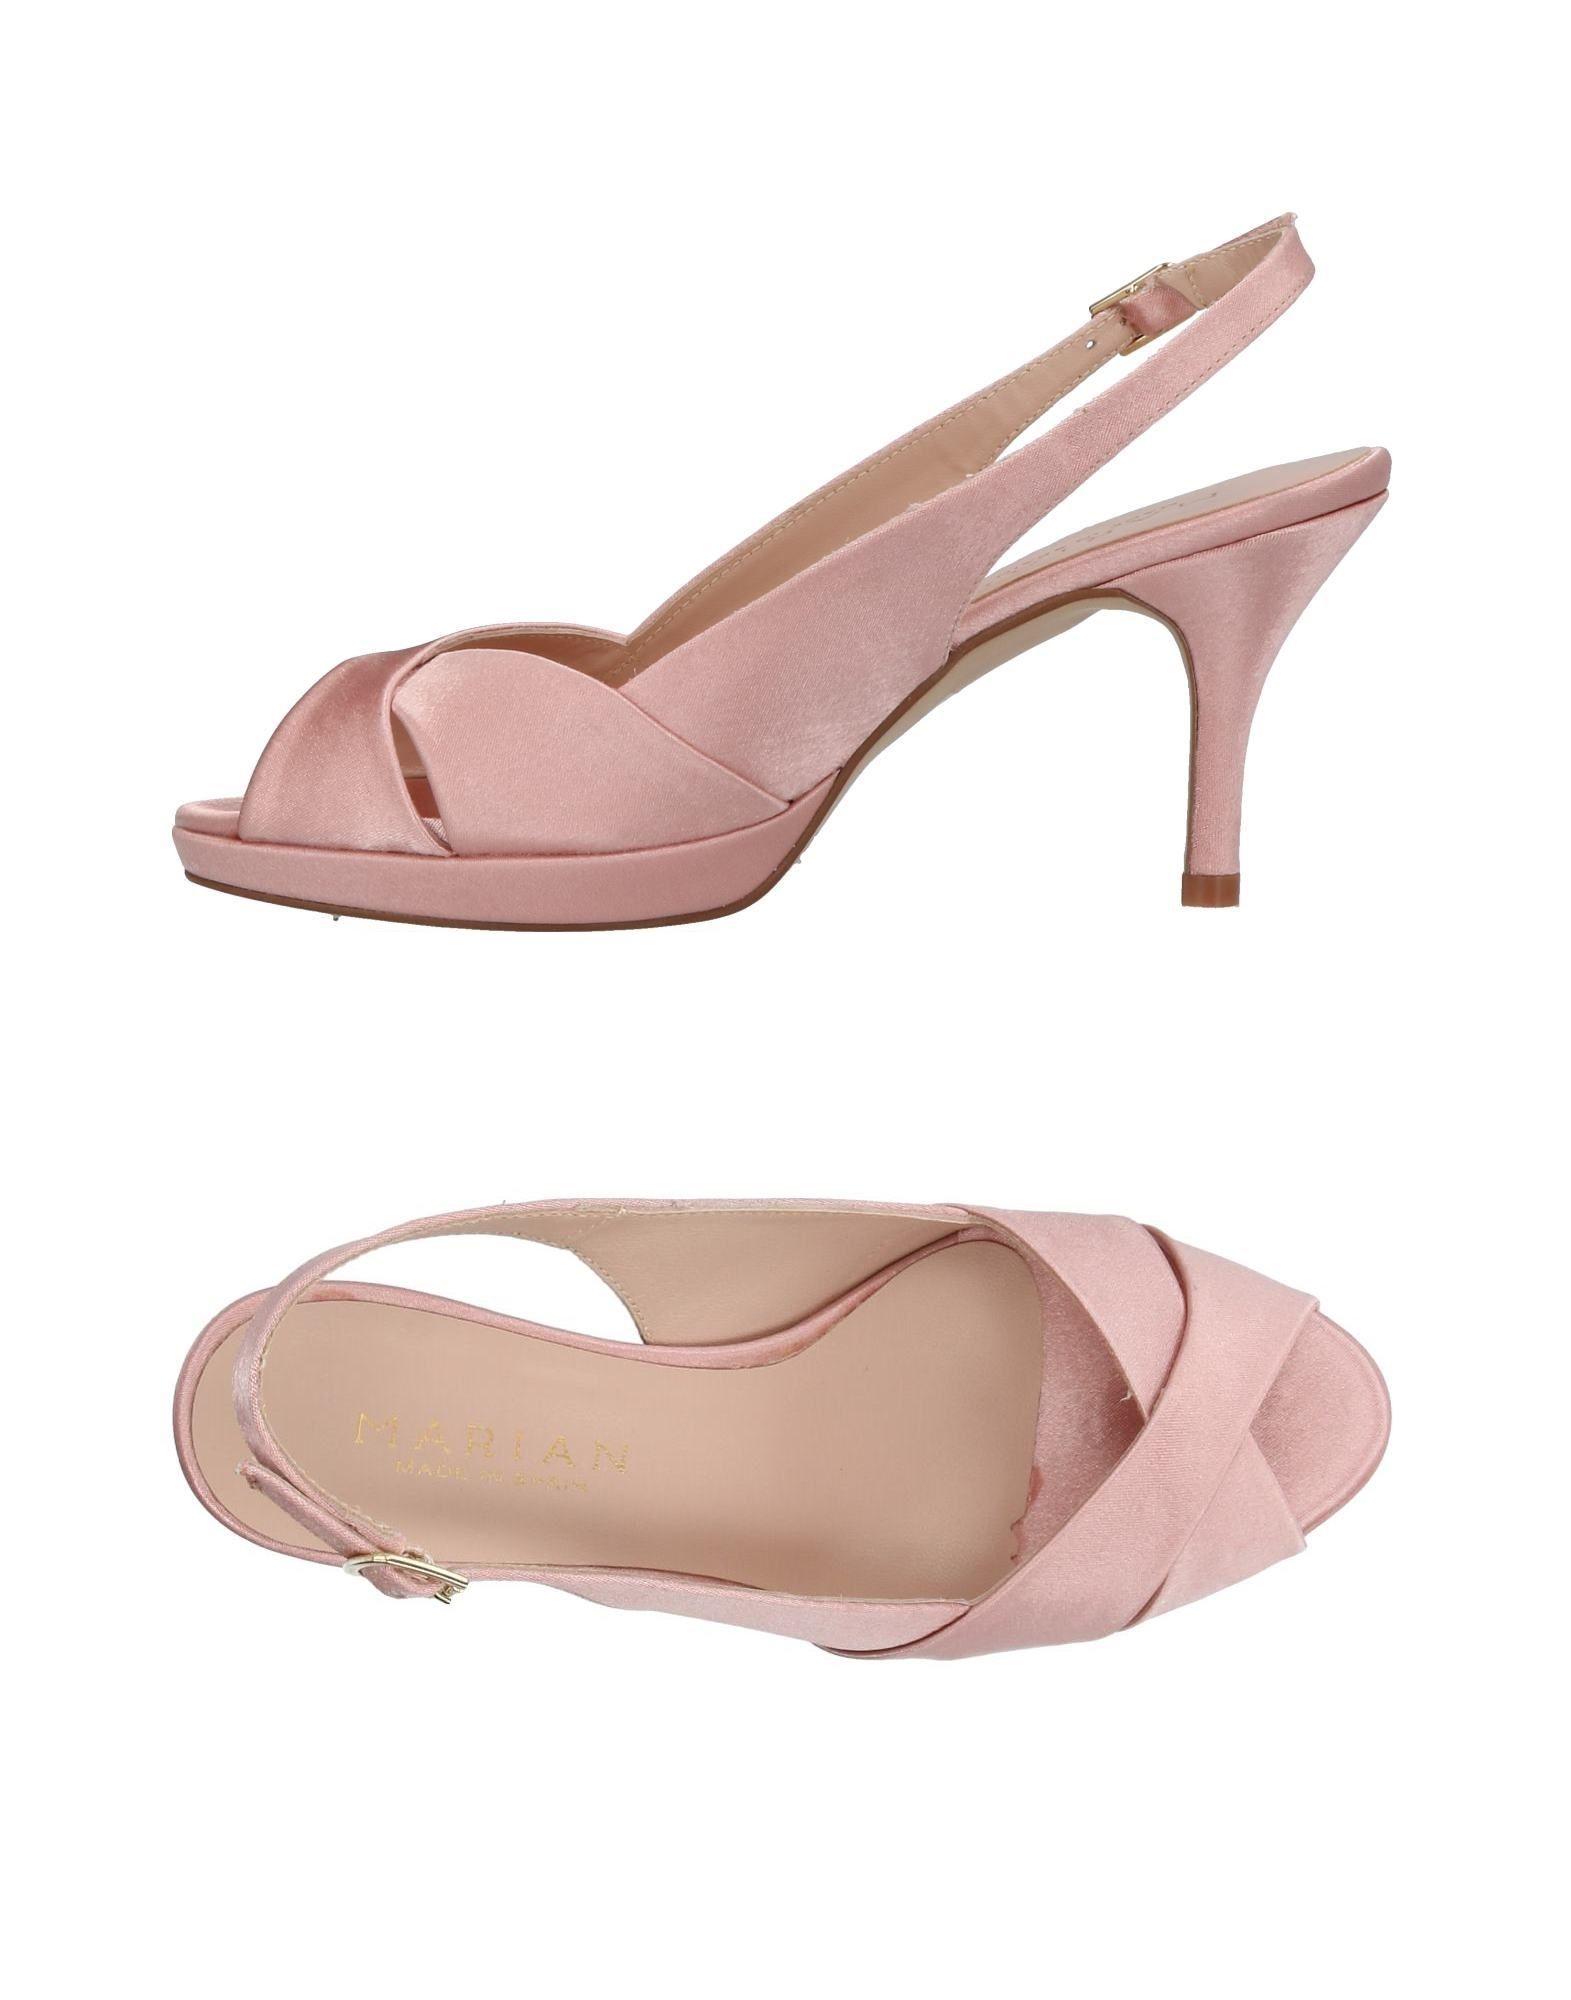 Sandales Marian Femme - Sandales Marian sur